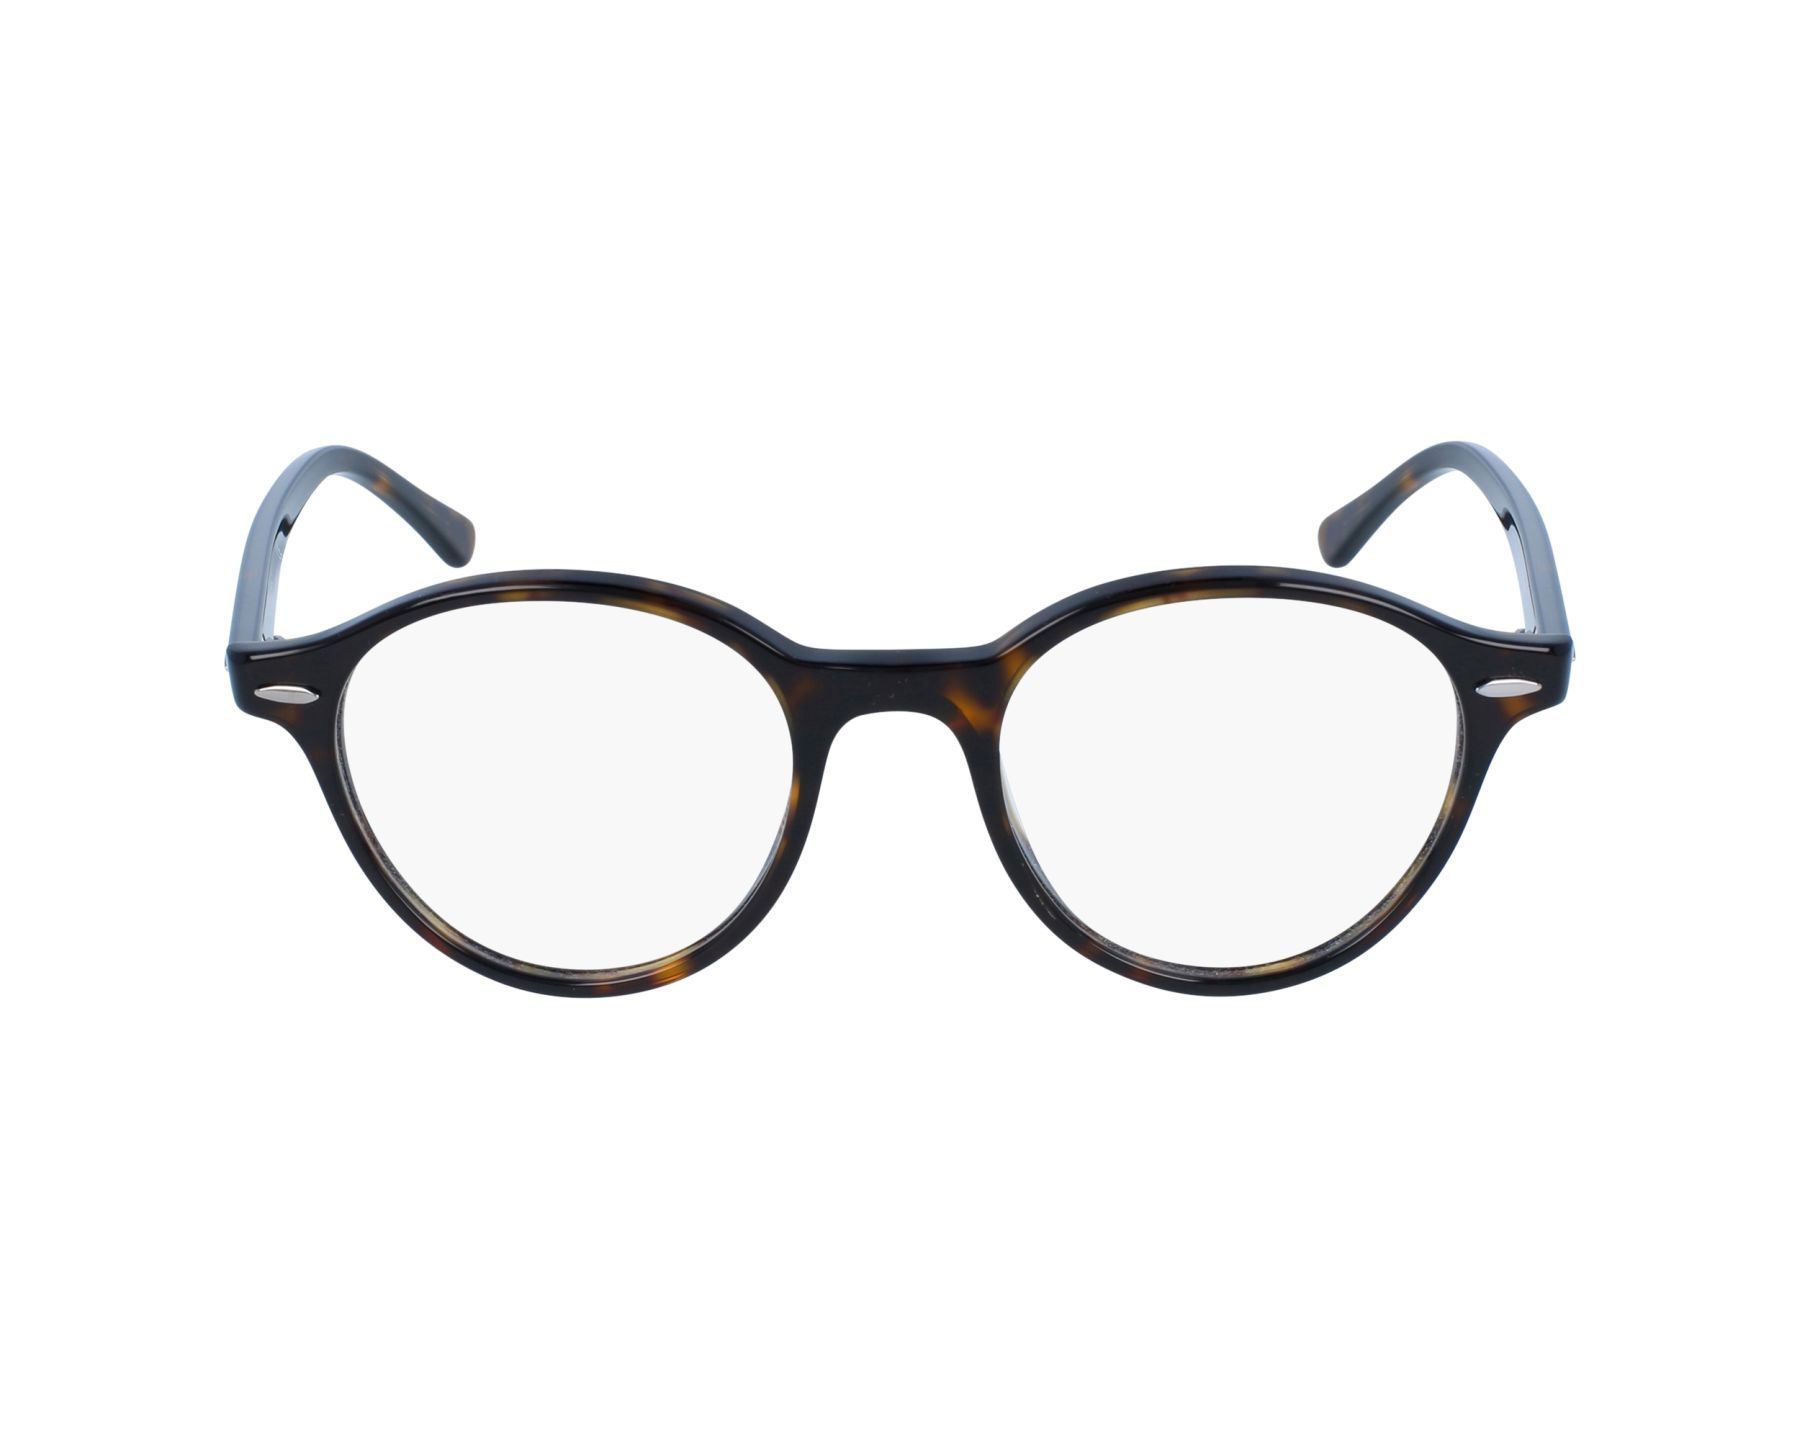 1cd544ad6f eyeglasses Ray-Ban RX-7118 2012 48-19 Havana profile view